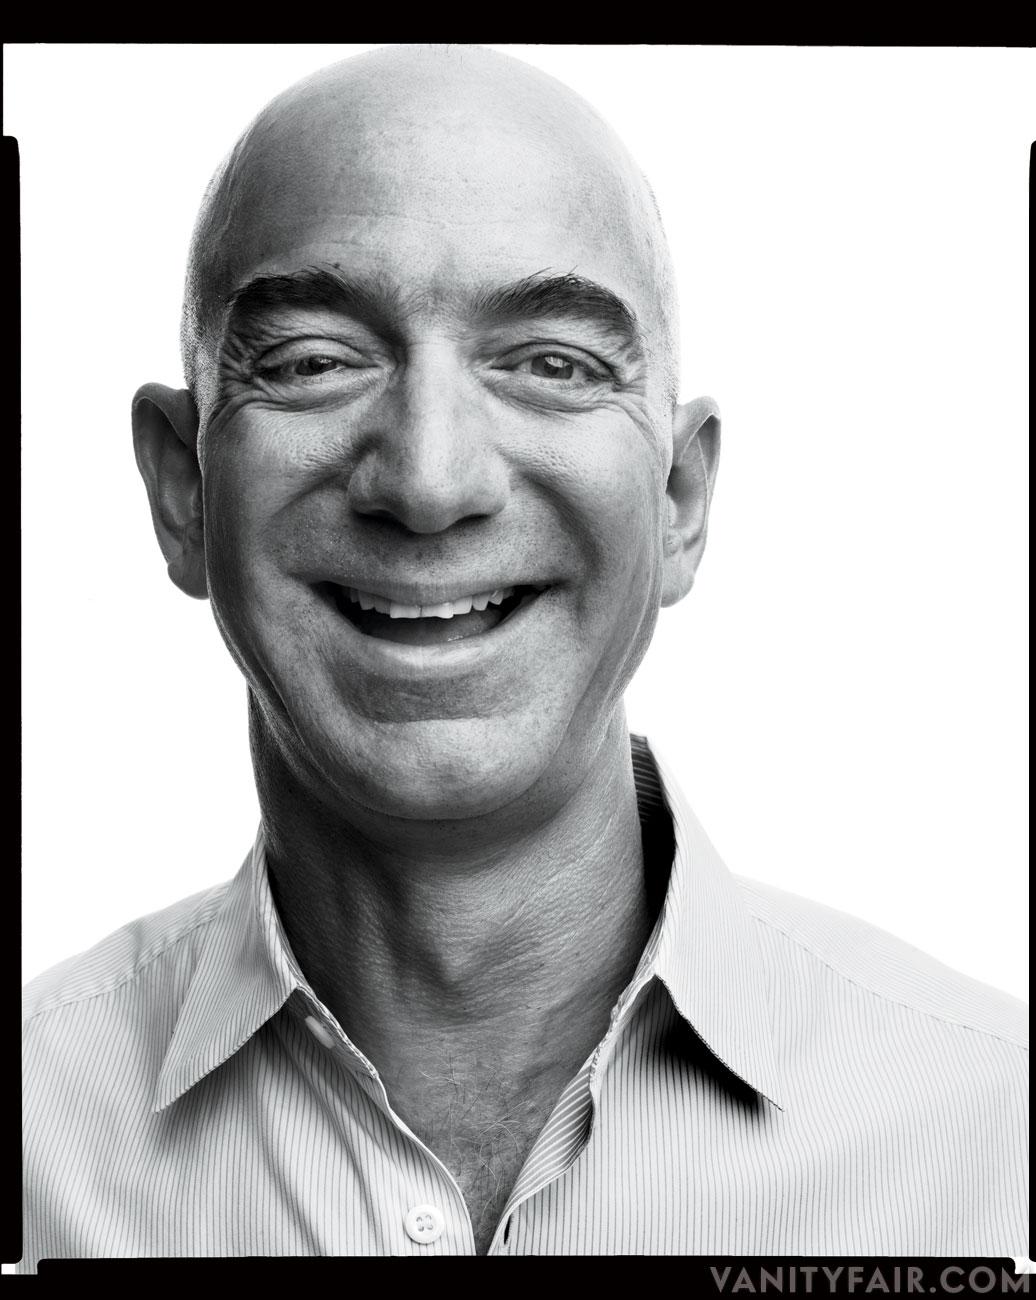 Power Listicle Disruptive Bezos Displaces Apple Execs On Vf Ranking